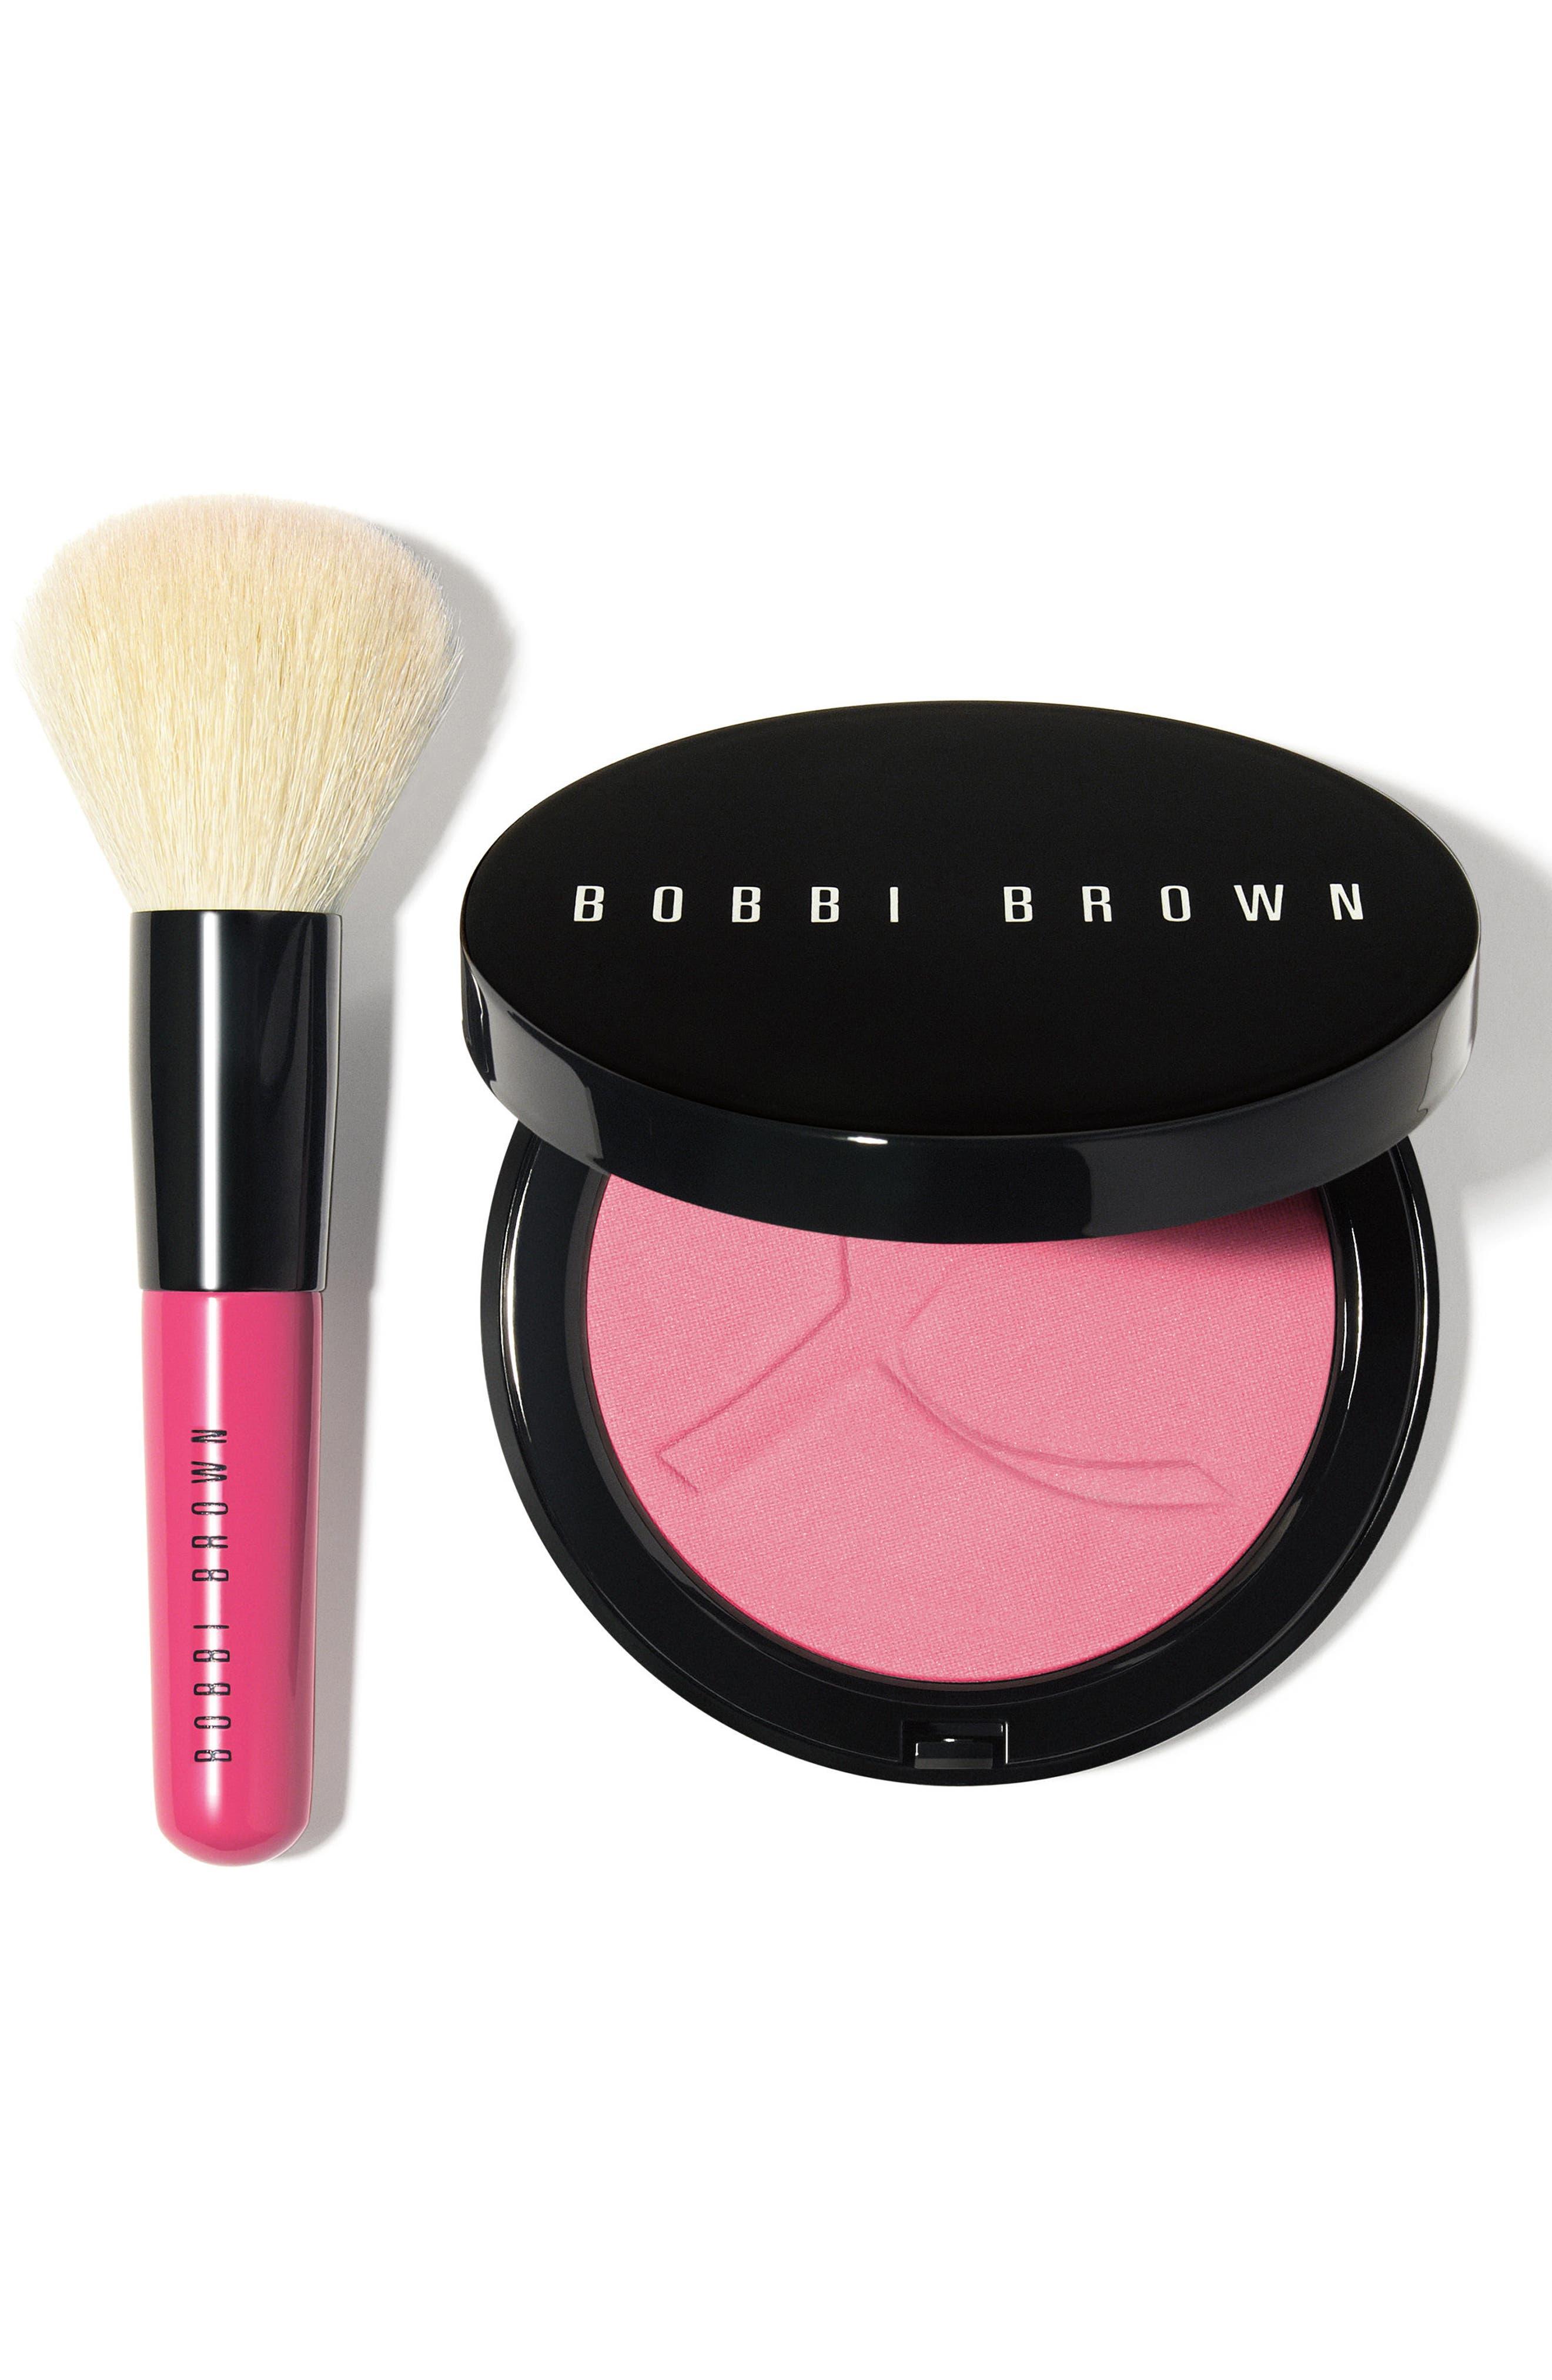 Bobbi Brown Pink Peony Illuminating Bronzing Powder Set ($69 Value)